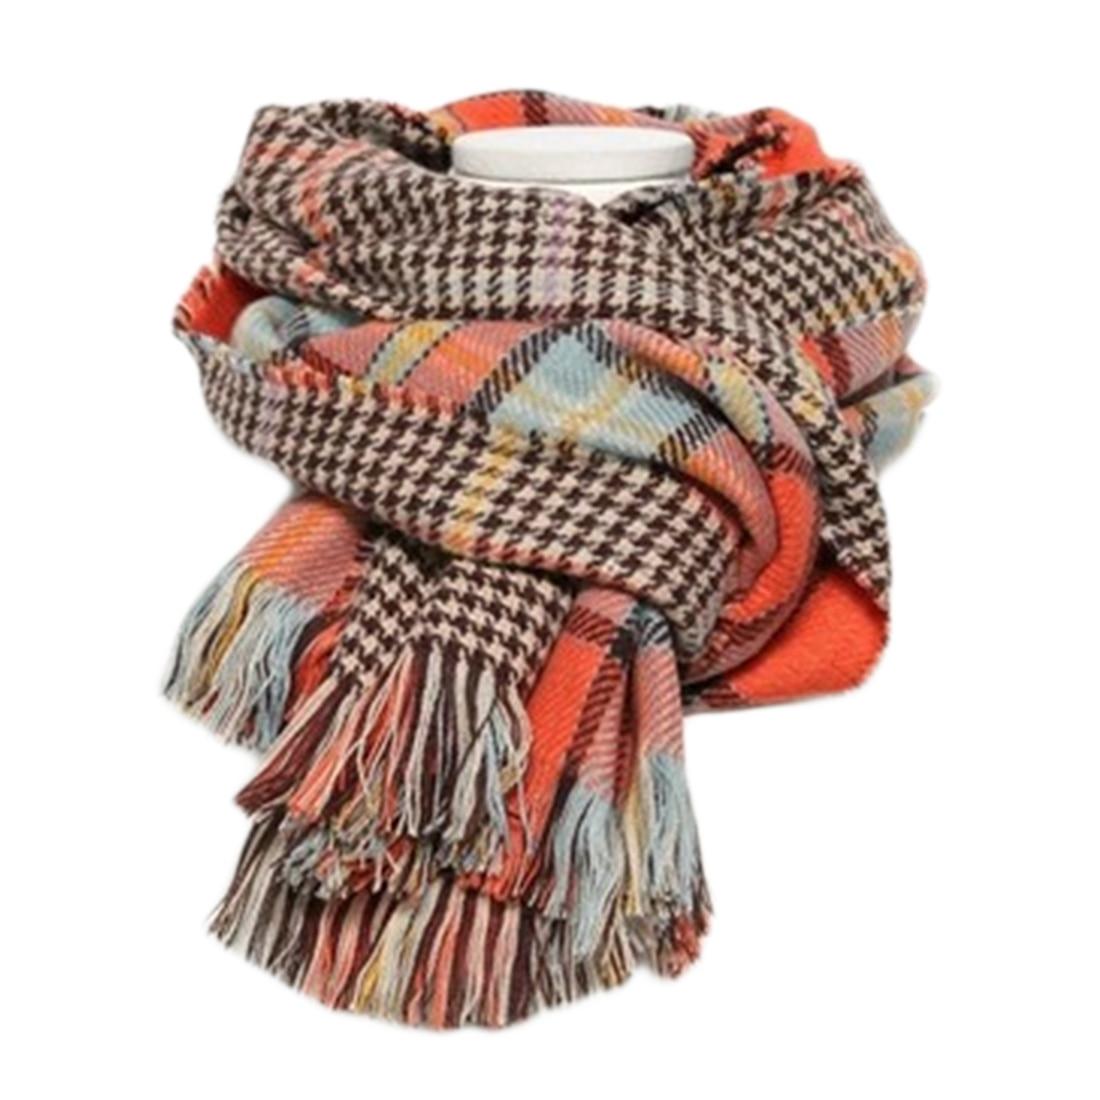 New Cashmere Scarf 2018 Pashmina Scarf Women Tassels Scarves Wraps Autumn Winter Shawls Thousand Bird Lattice Double-sided Scarf